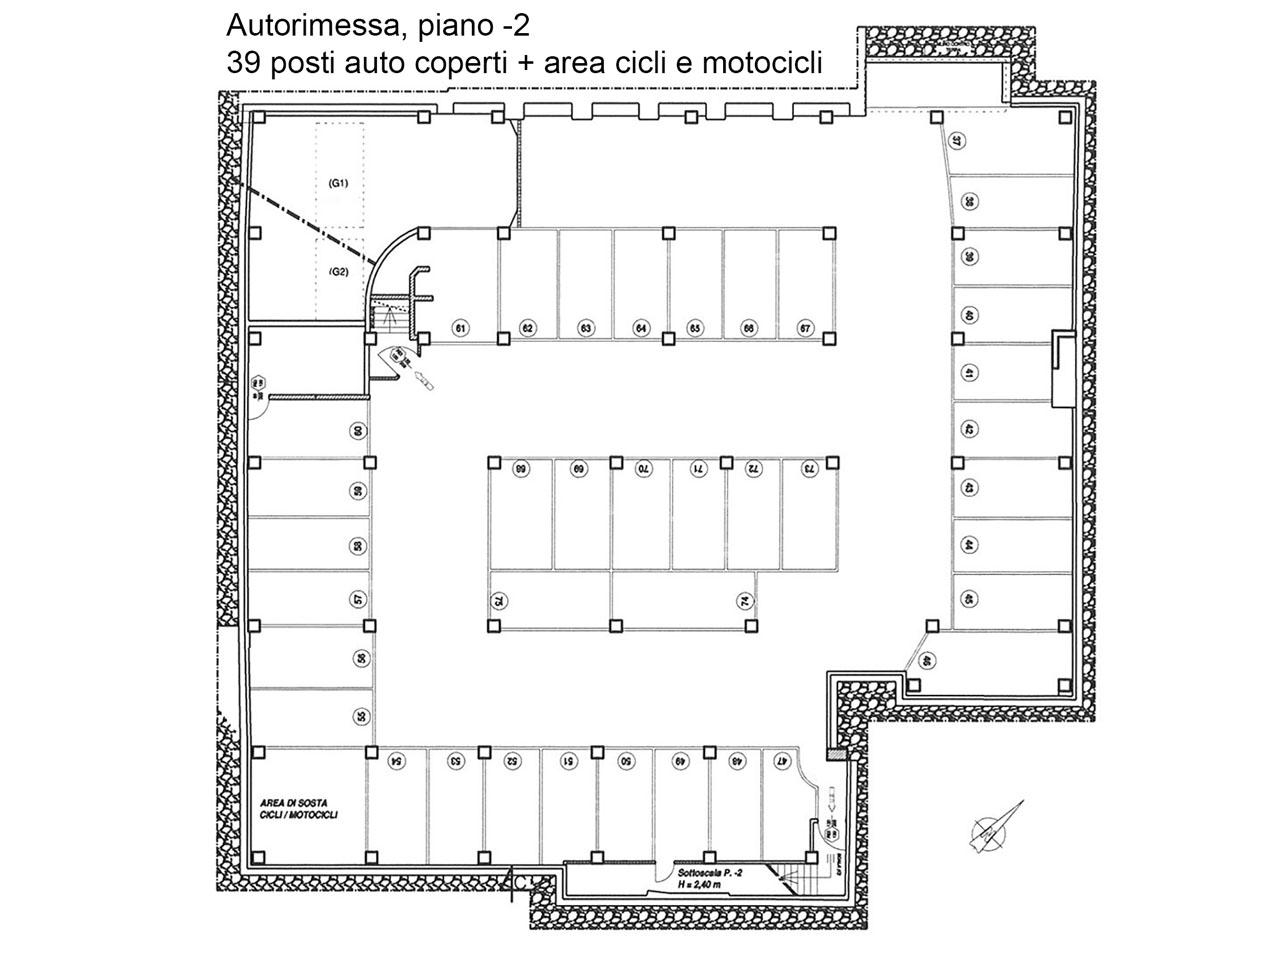 Floor plan of the garage at the second basement floor - Atlantic Business Center - Milan